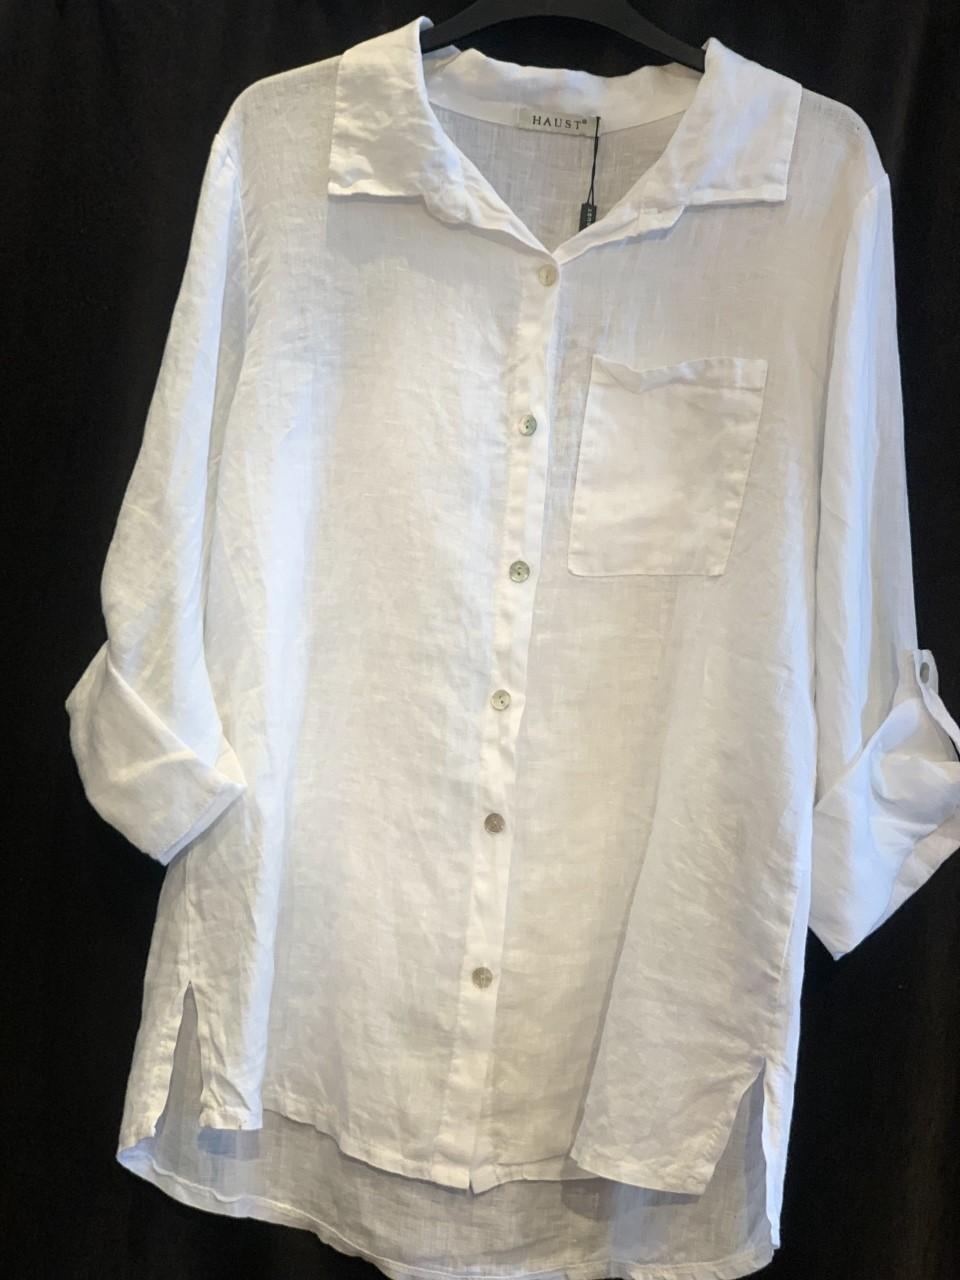 HAUST Basic Lin shirt skjorte